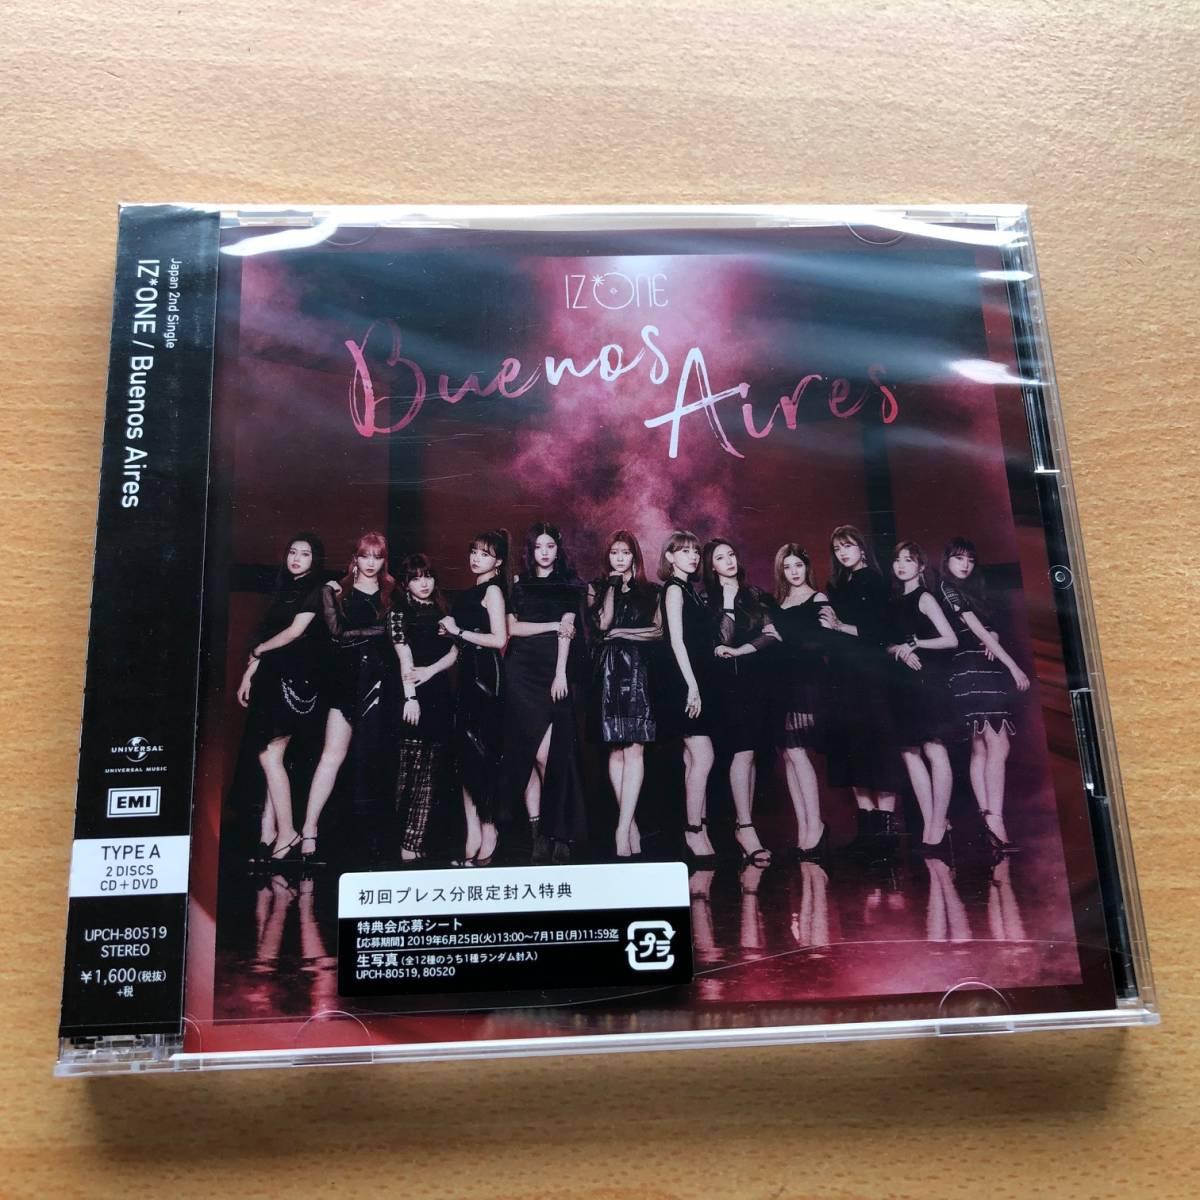 IZ*ONE(アイズワン)JAPAN 2nd Single『 Buenos Aires 』限定特典生写真 矢吹奈子 & CD(DVD)TYPE-A盤 セット 新品 未試聴_画像2